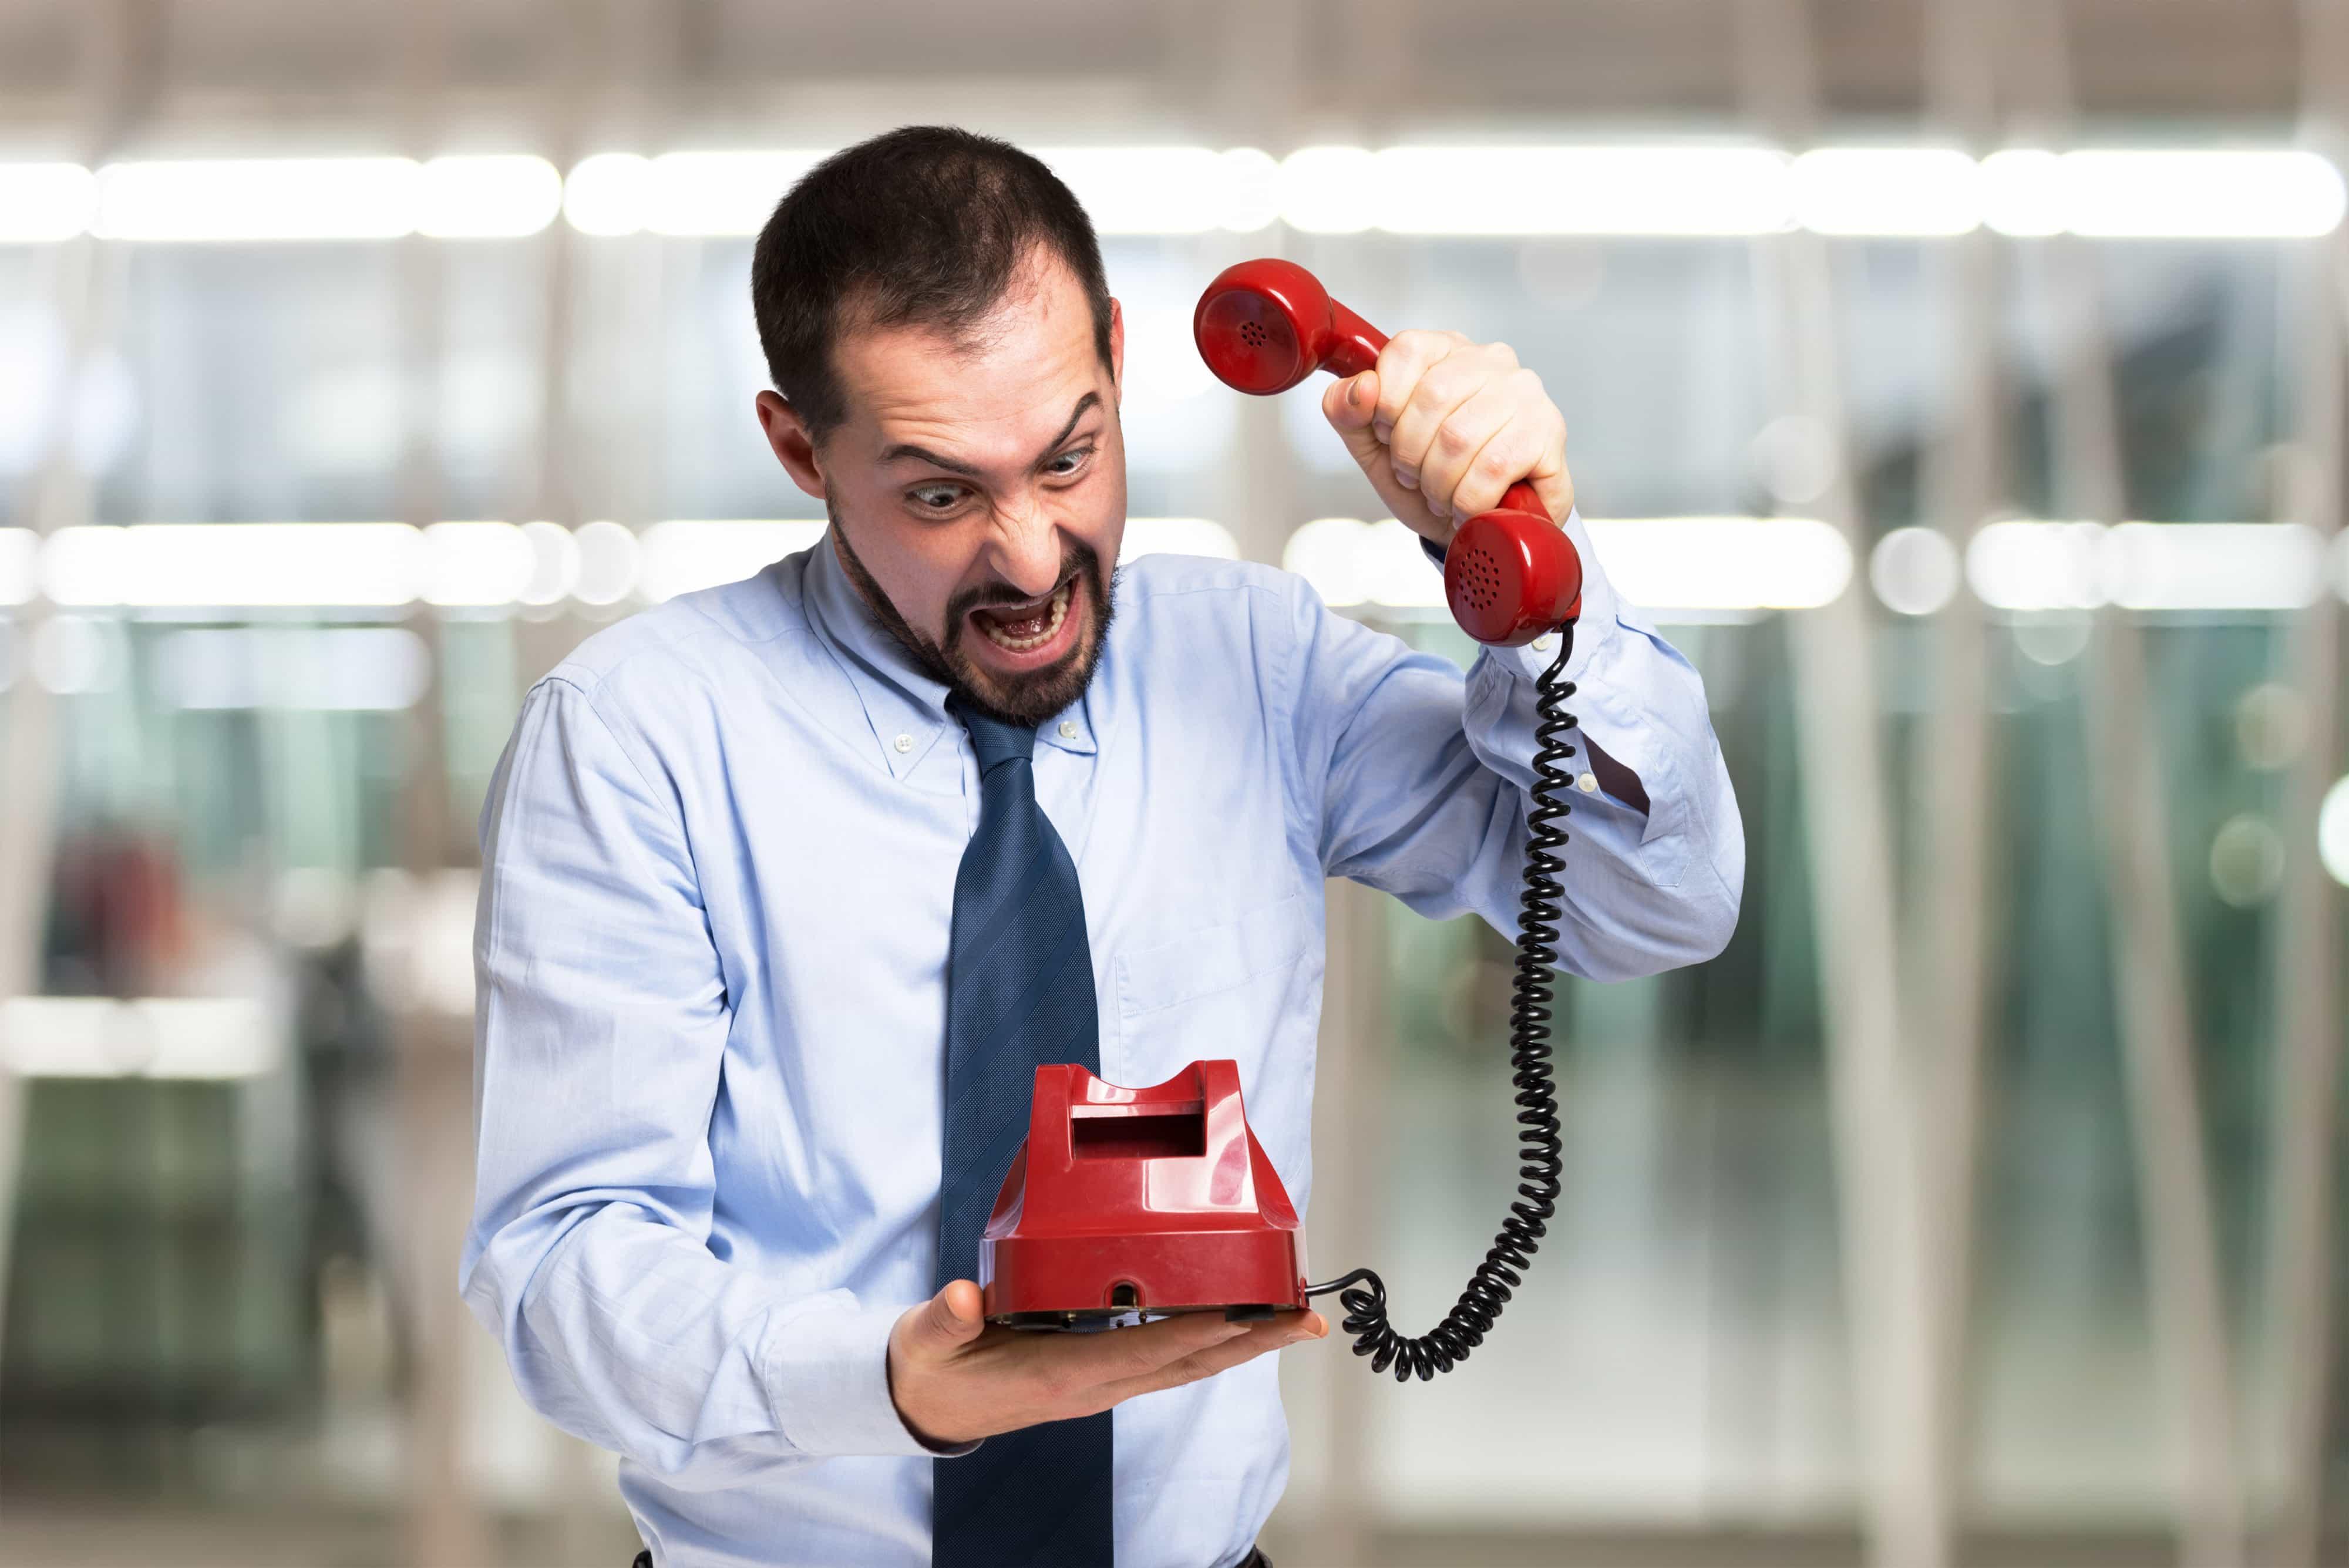 Angry man slamming the phone down